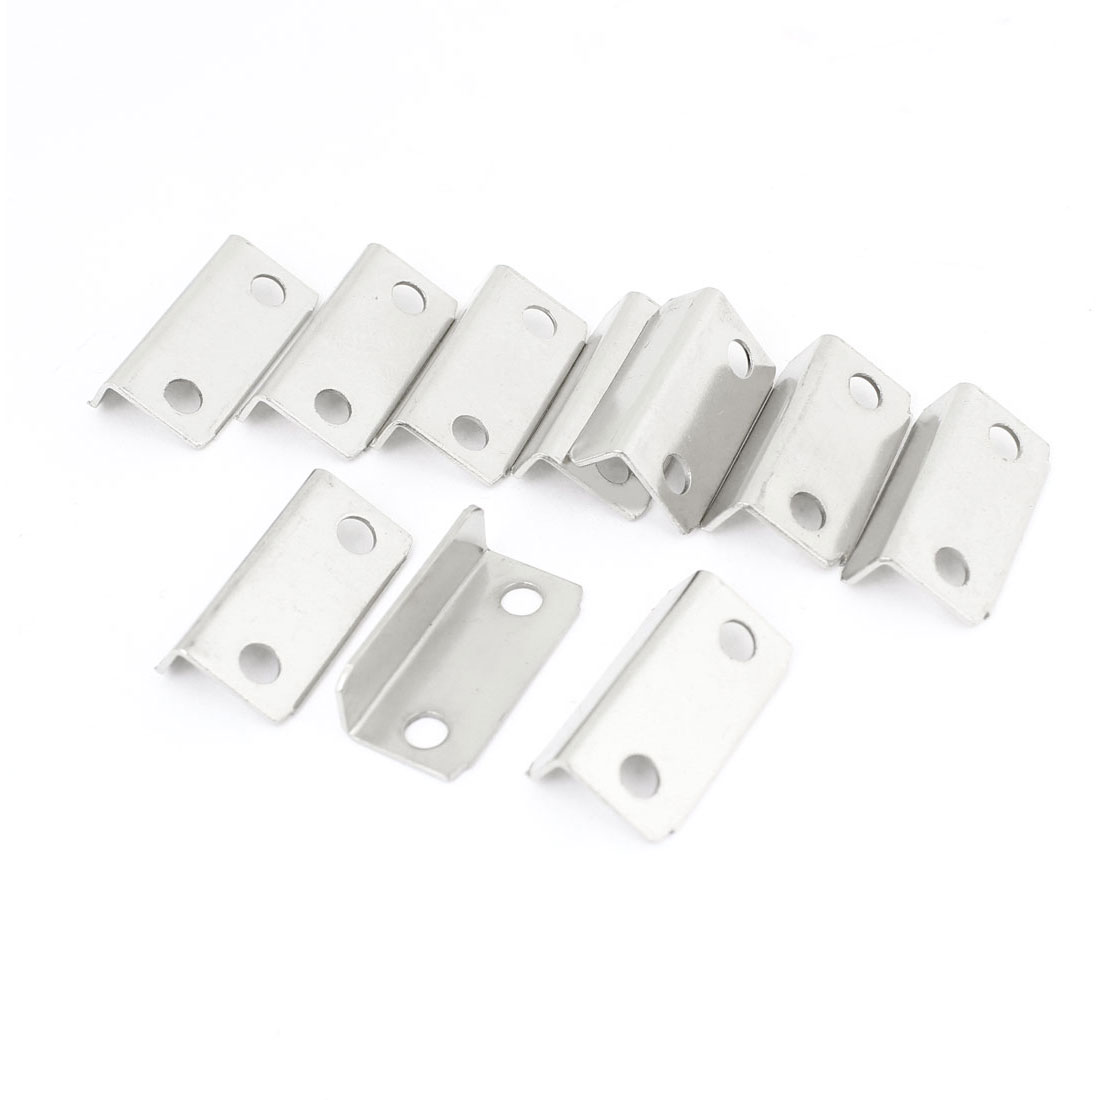 10 Pcs Furniture Fittings Metallic Strengthen Corner Brace Silver Tone